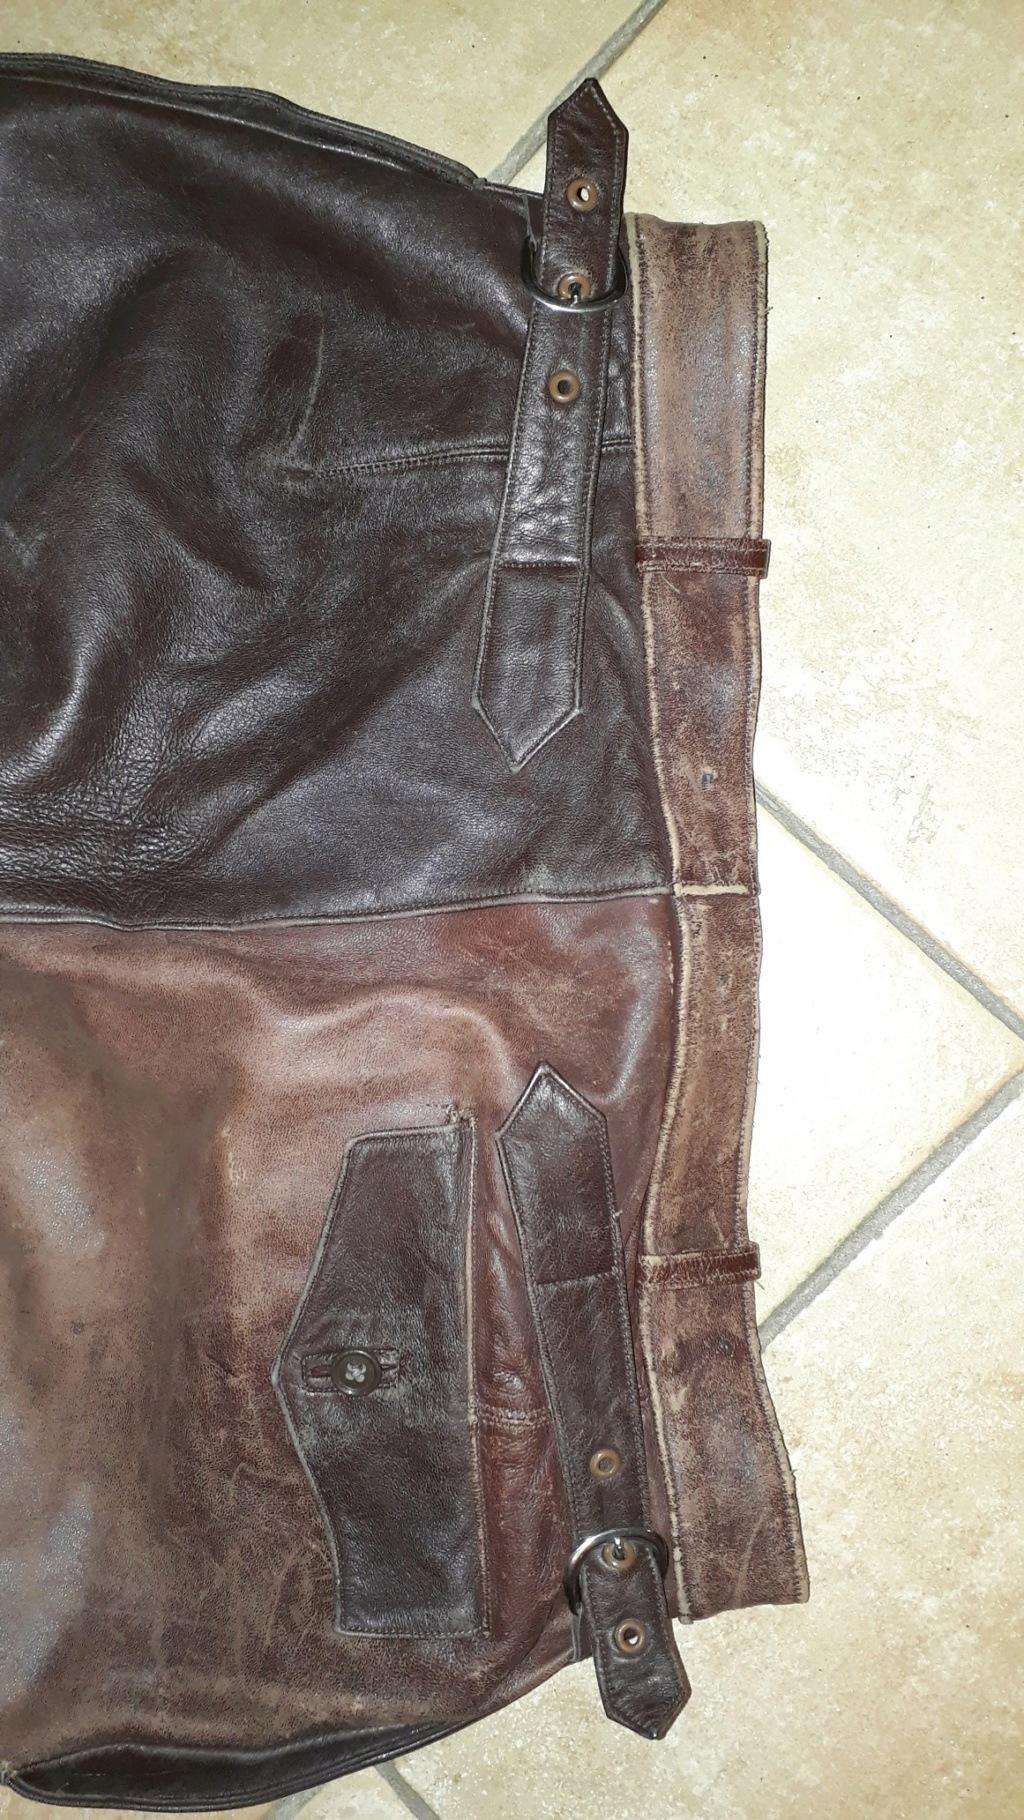 Pantalon cuir civil ou militaire ? Pantal10